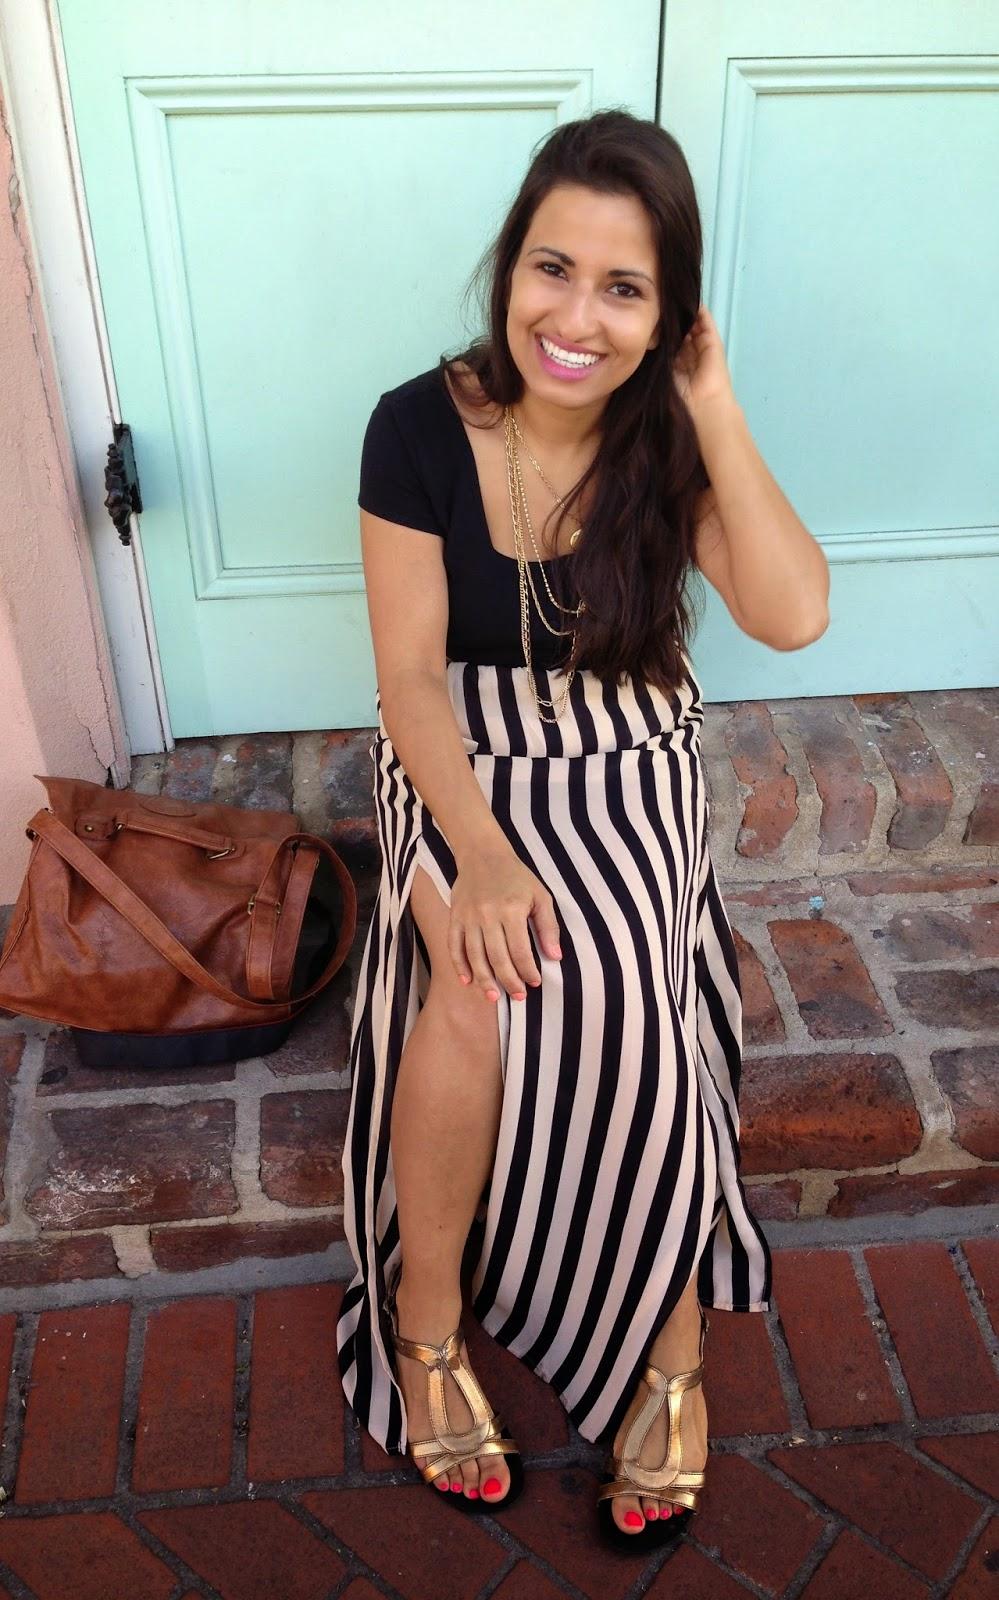 Stripe Maxi Skirt & Cropped Top – Dina's Days